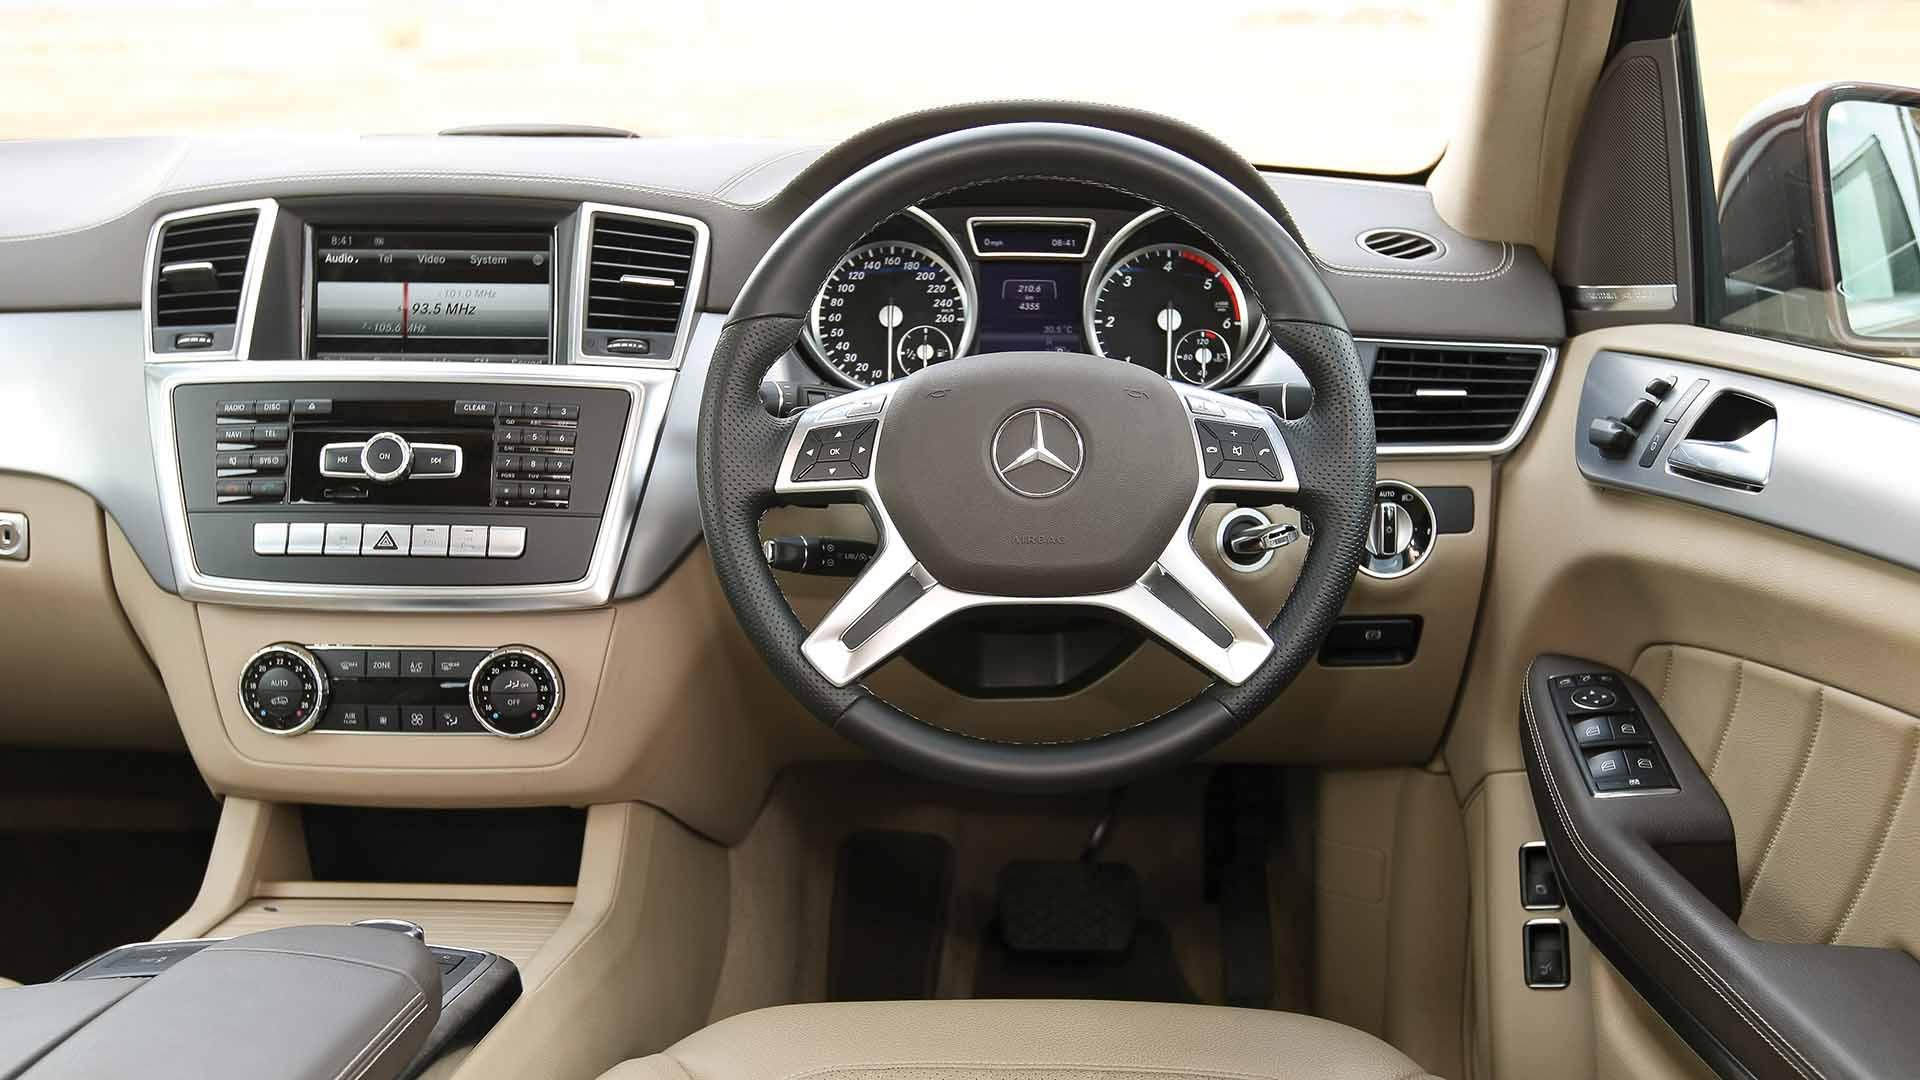 Mercedes Benz gl class 2013 GL 350 CDI luxury Interior Car s